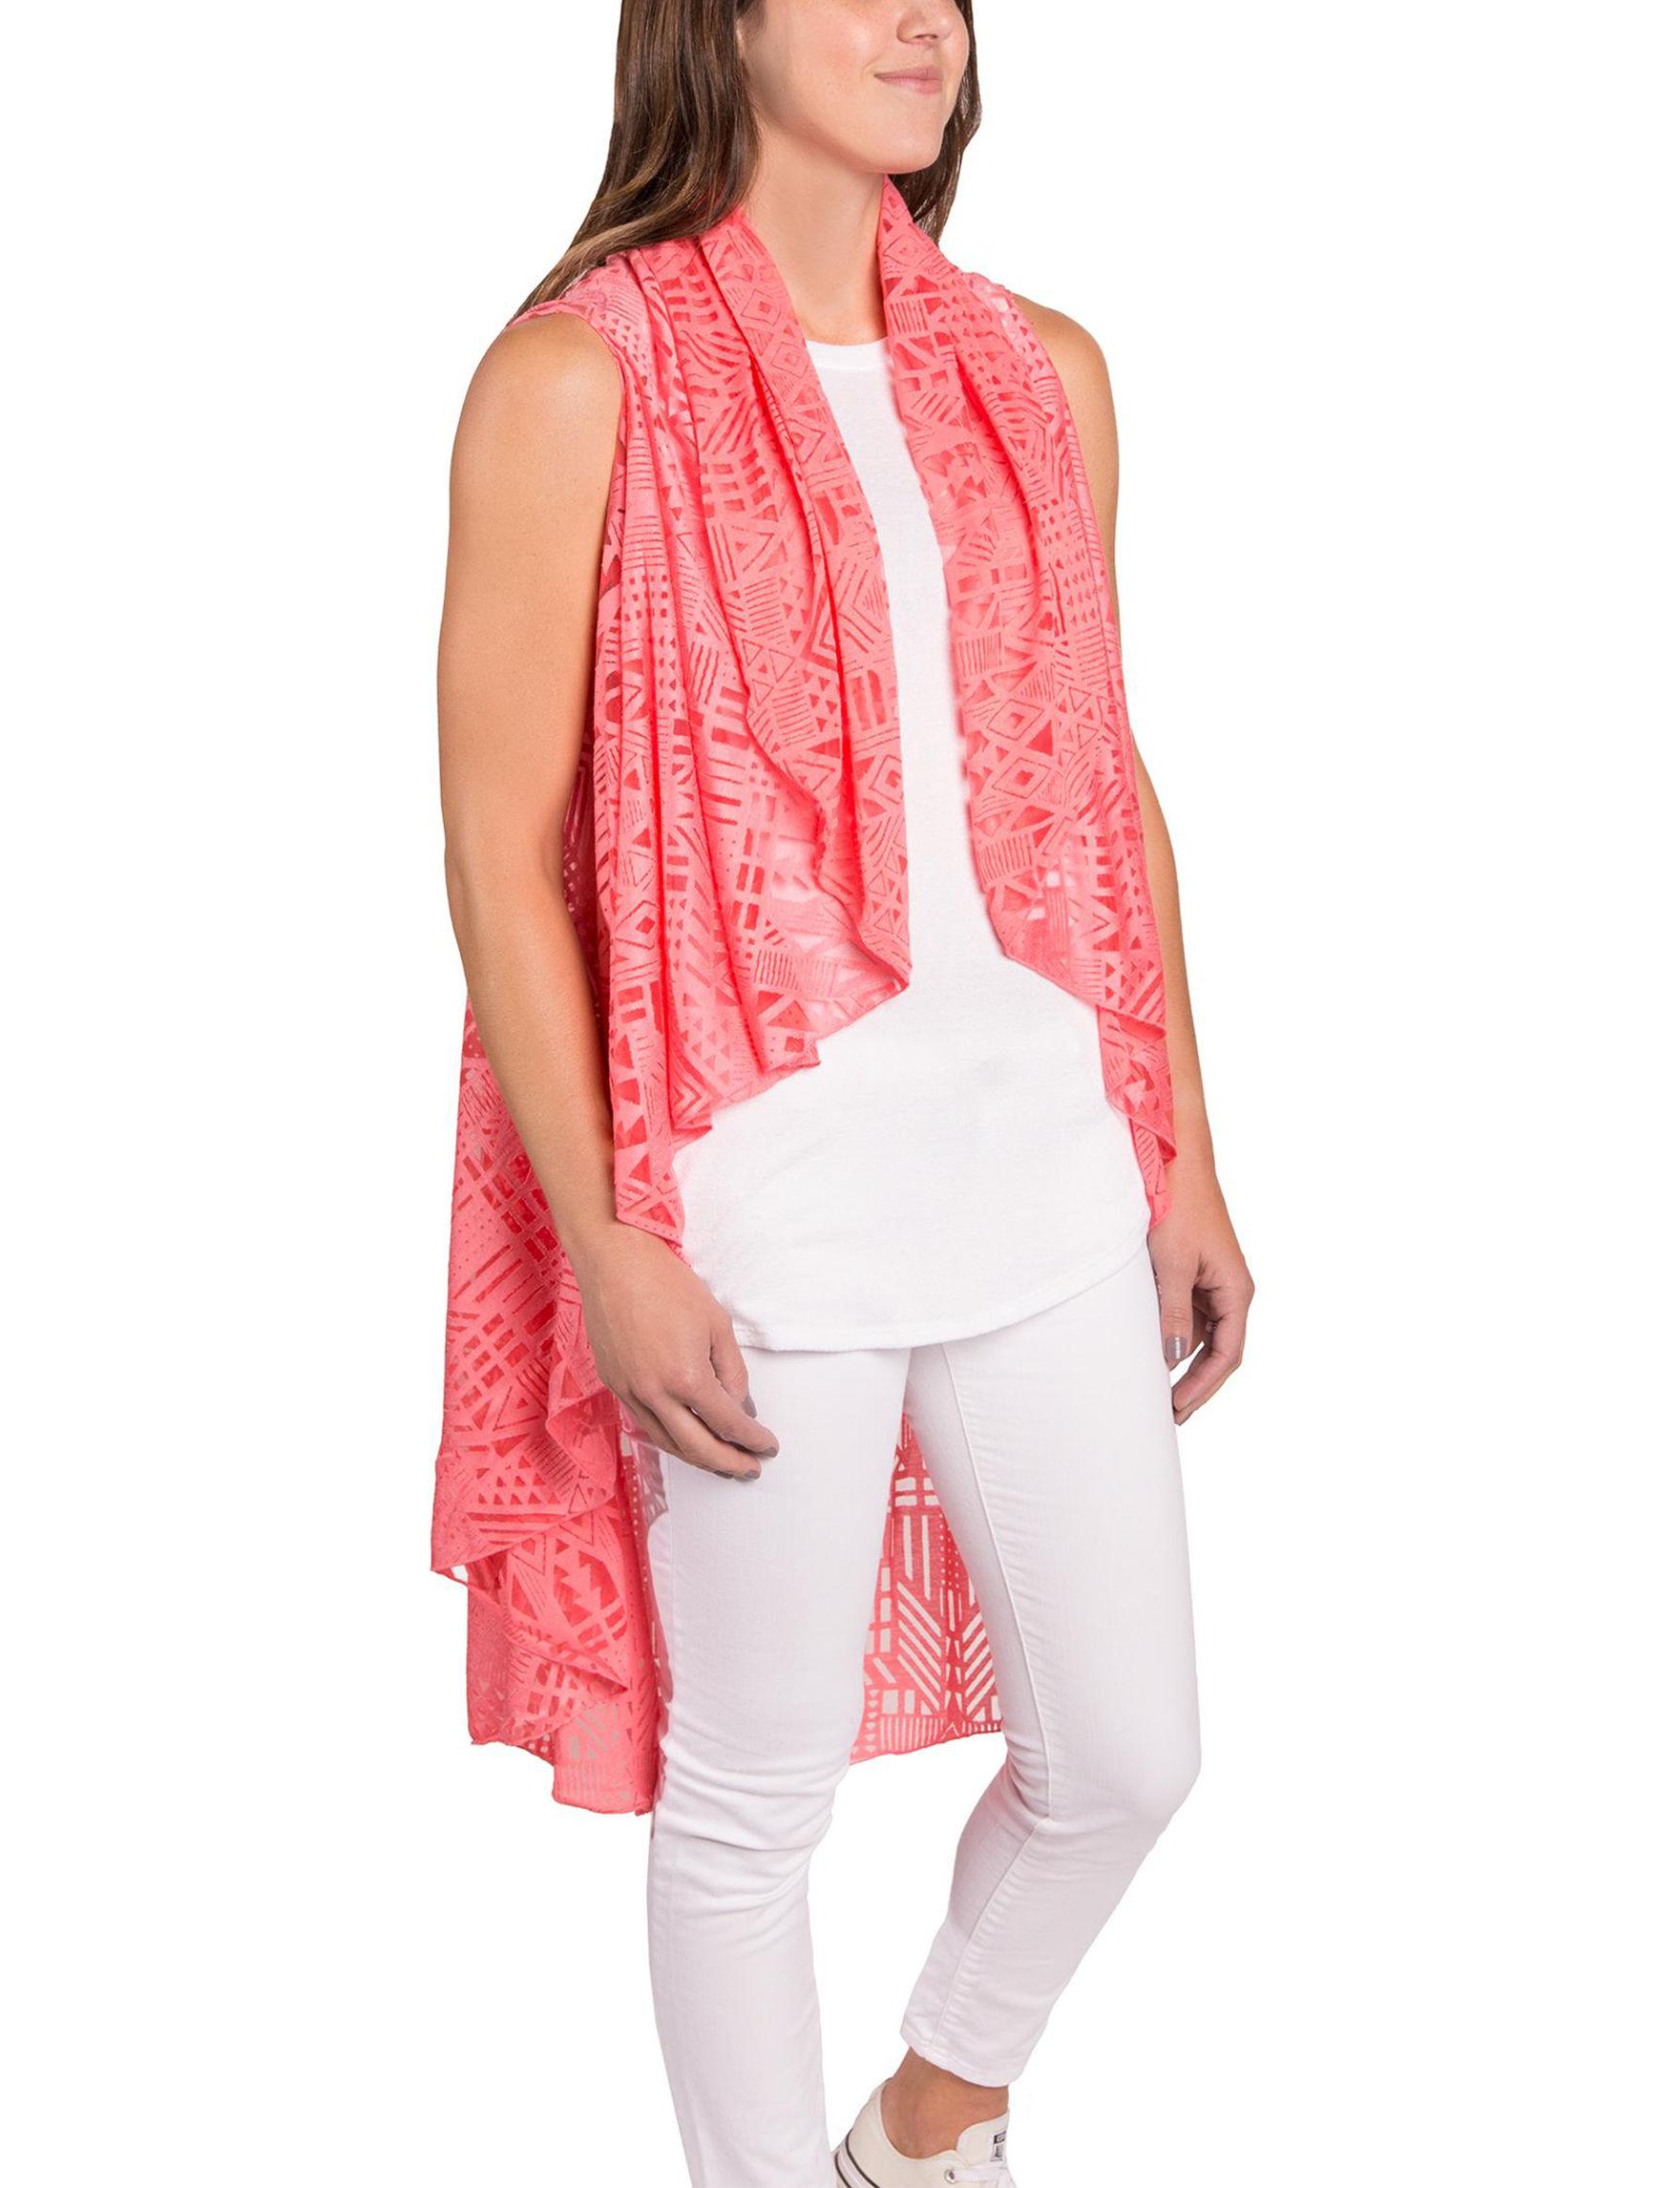 Demdaco Coral Scarves & Wraps